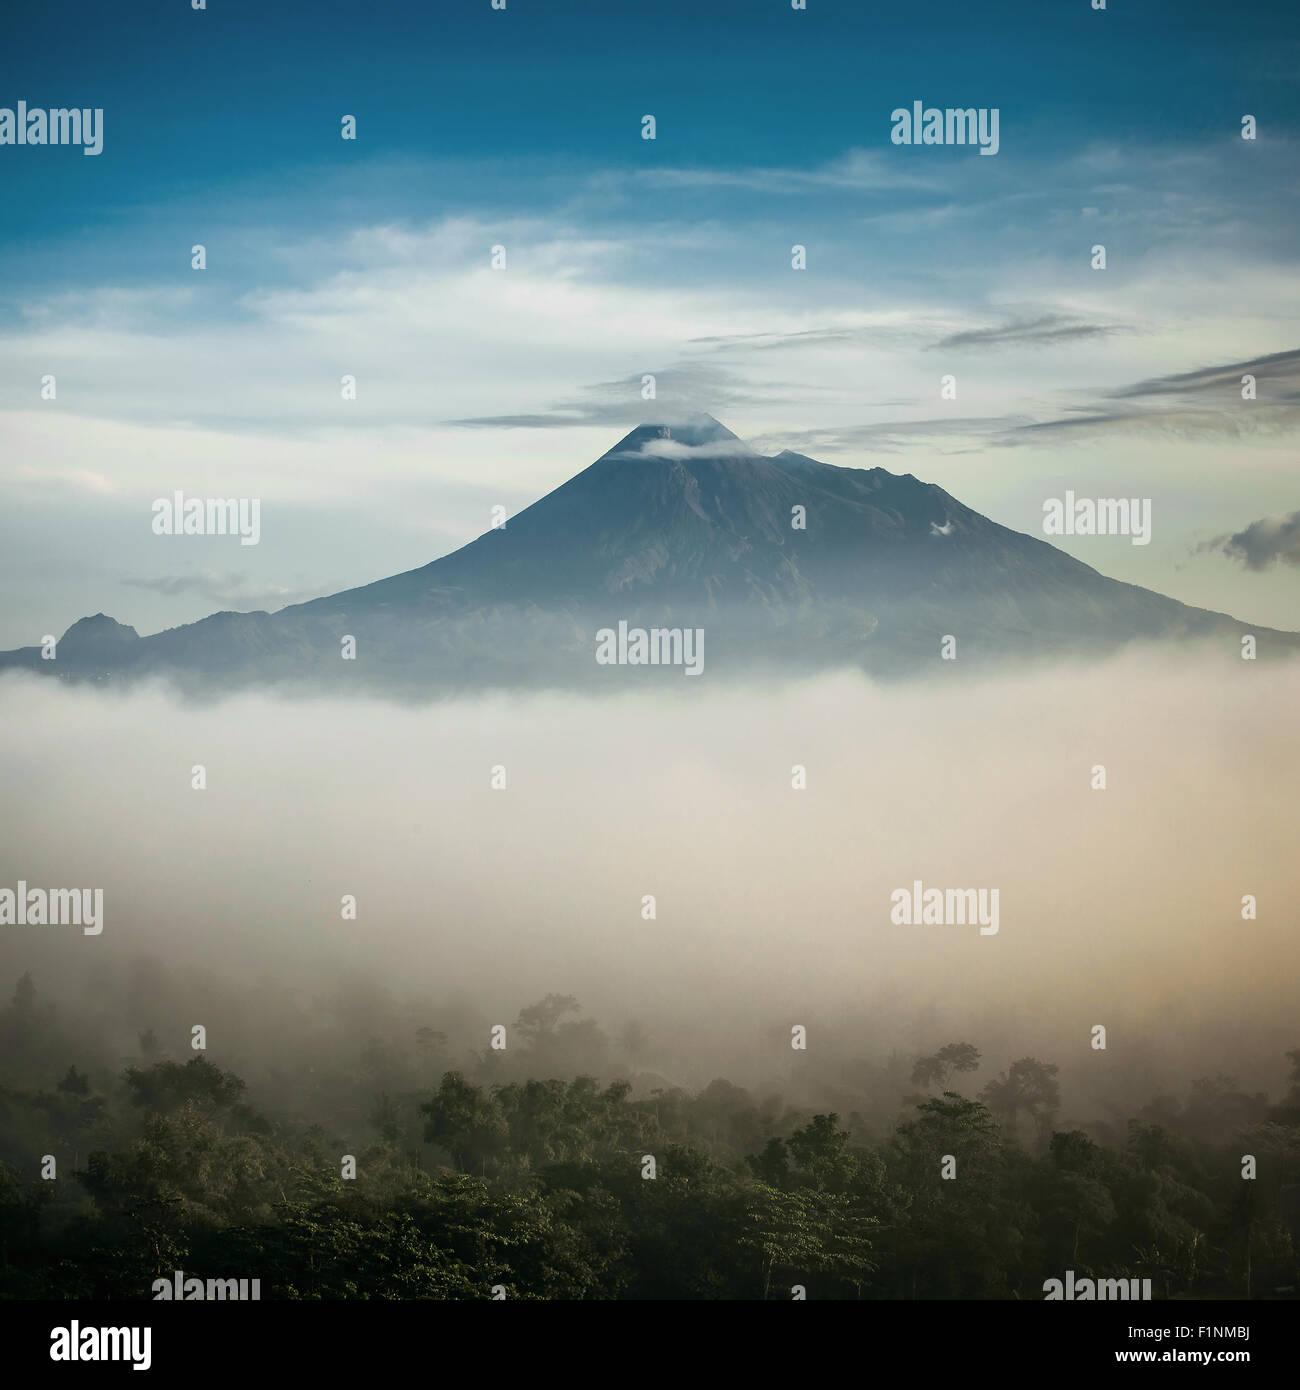 Mountain Merapi volcano, Java, Indonesia. Retro stylised photo - Stock Image